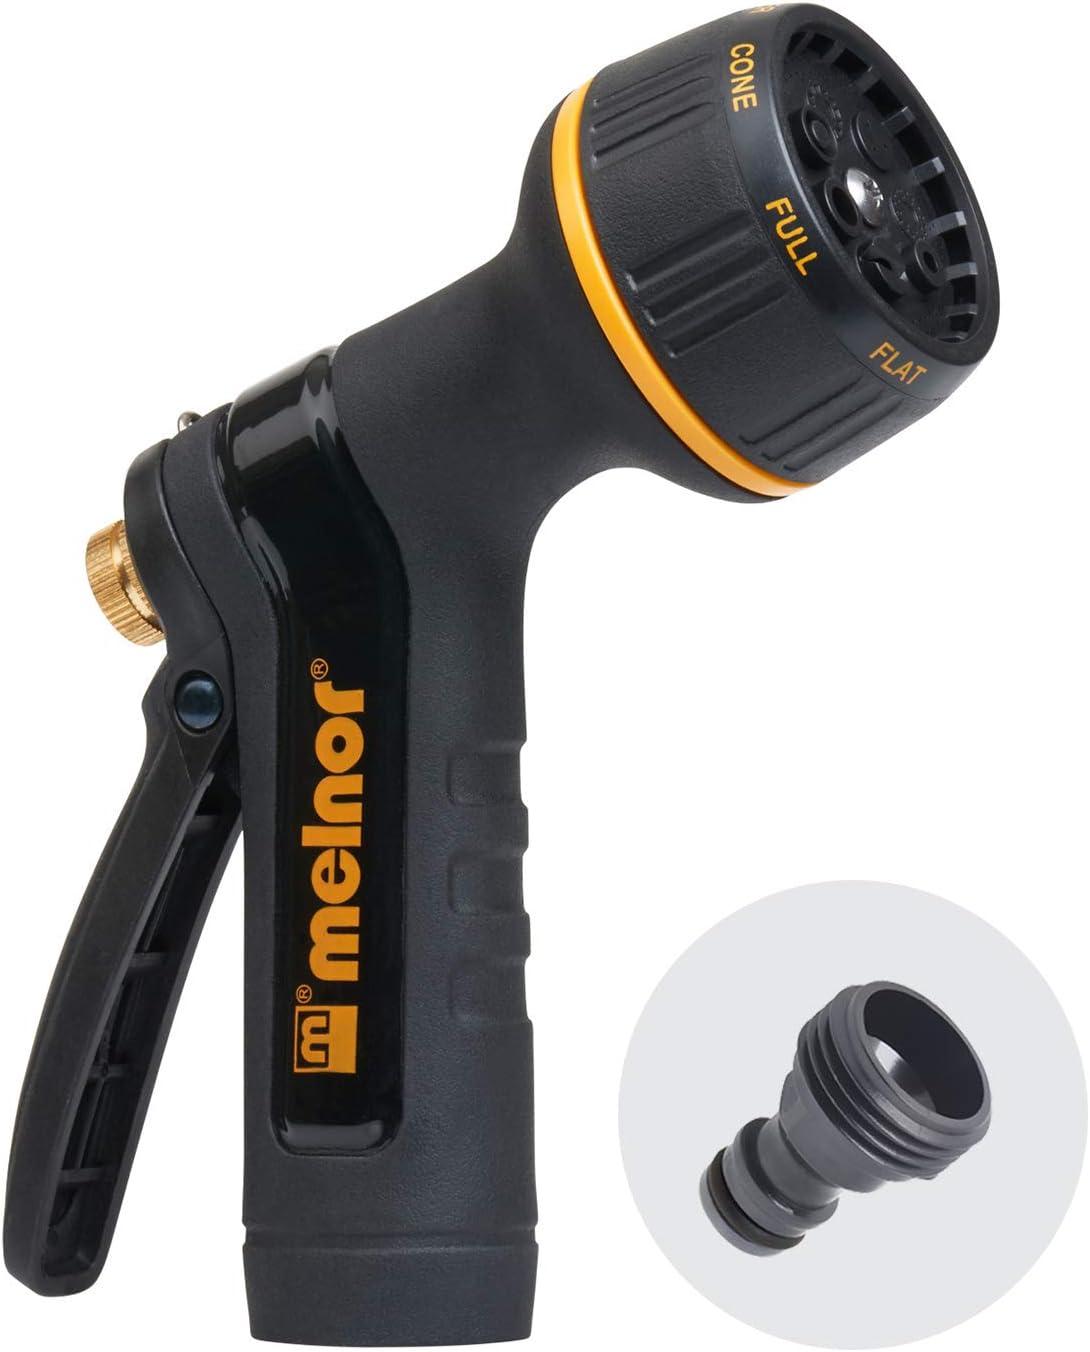 Best for Multi-Purpose: Melnor Metal Rear Trigger Nozzle